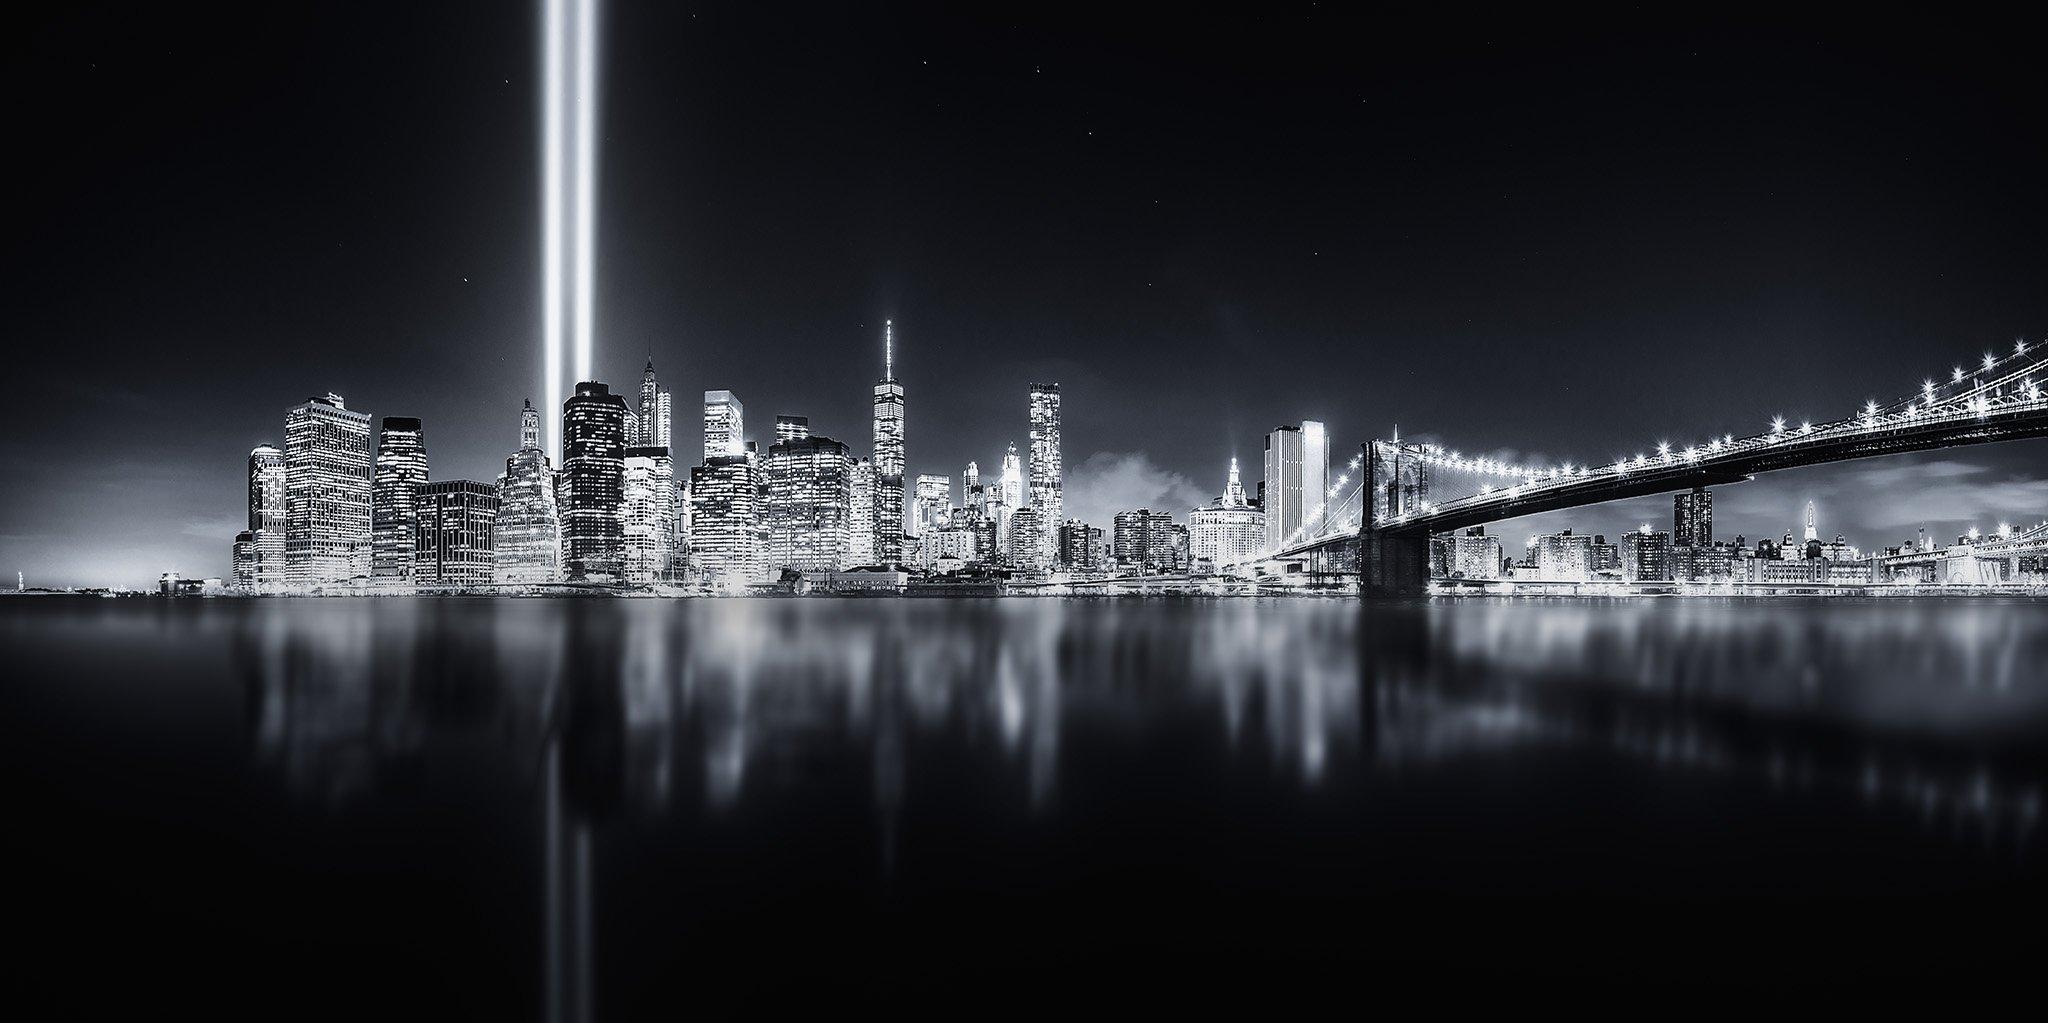 Unforgettable 9-11 III